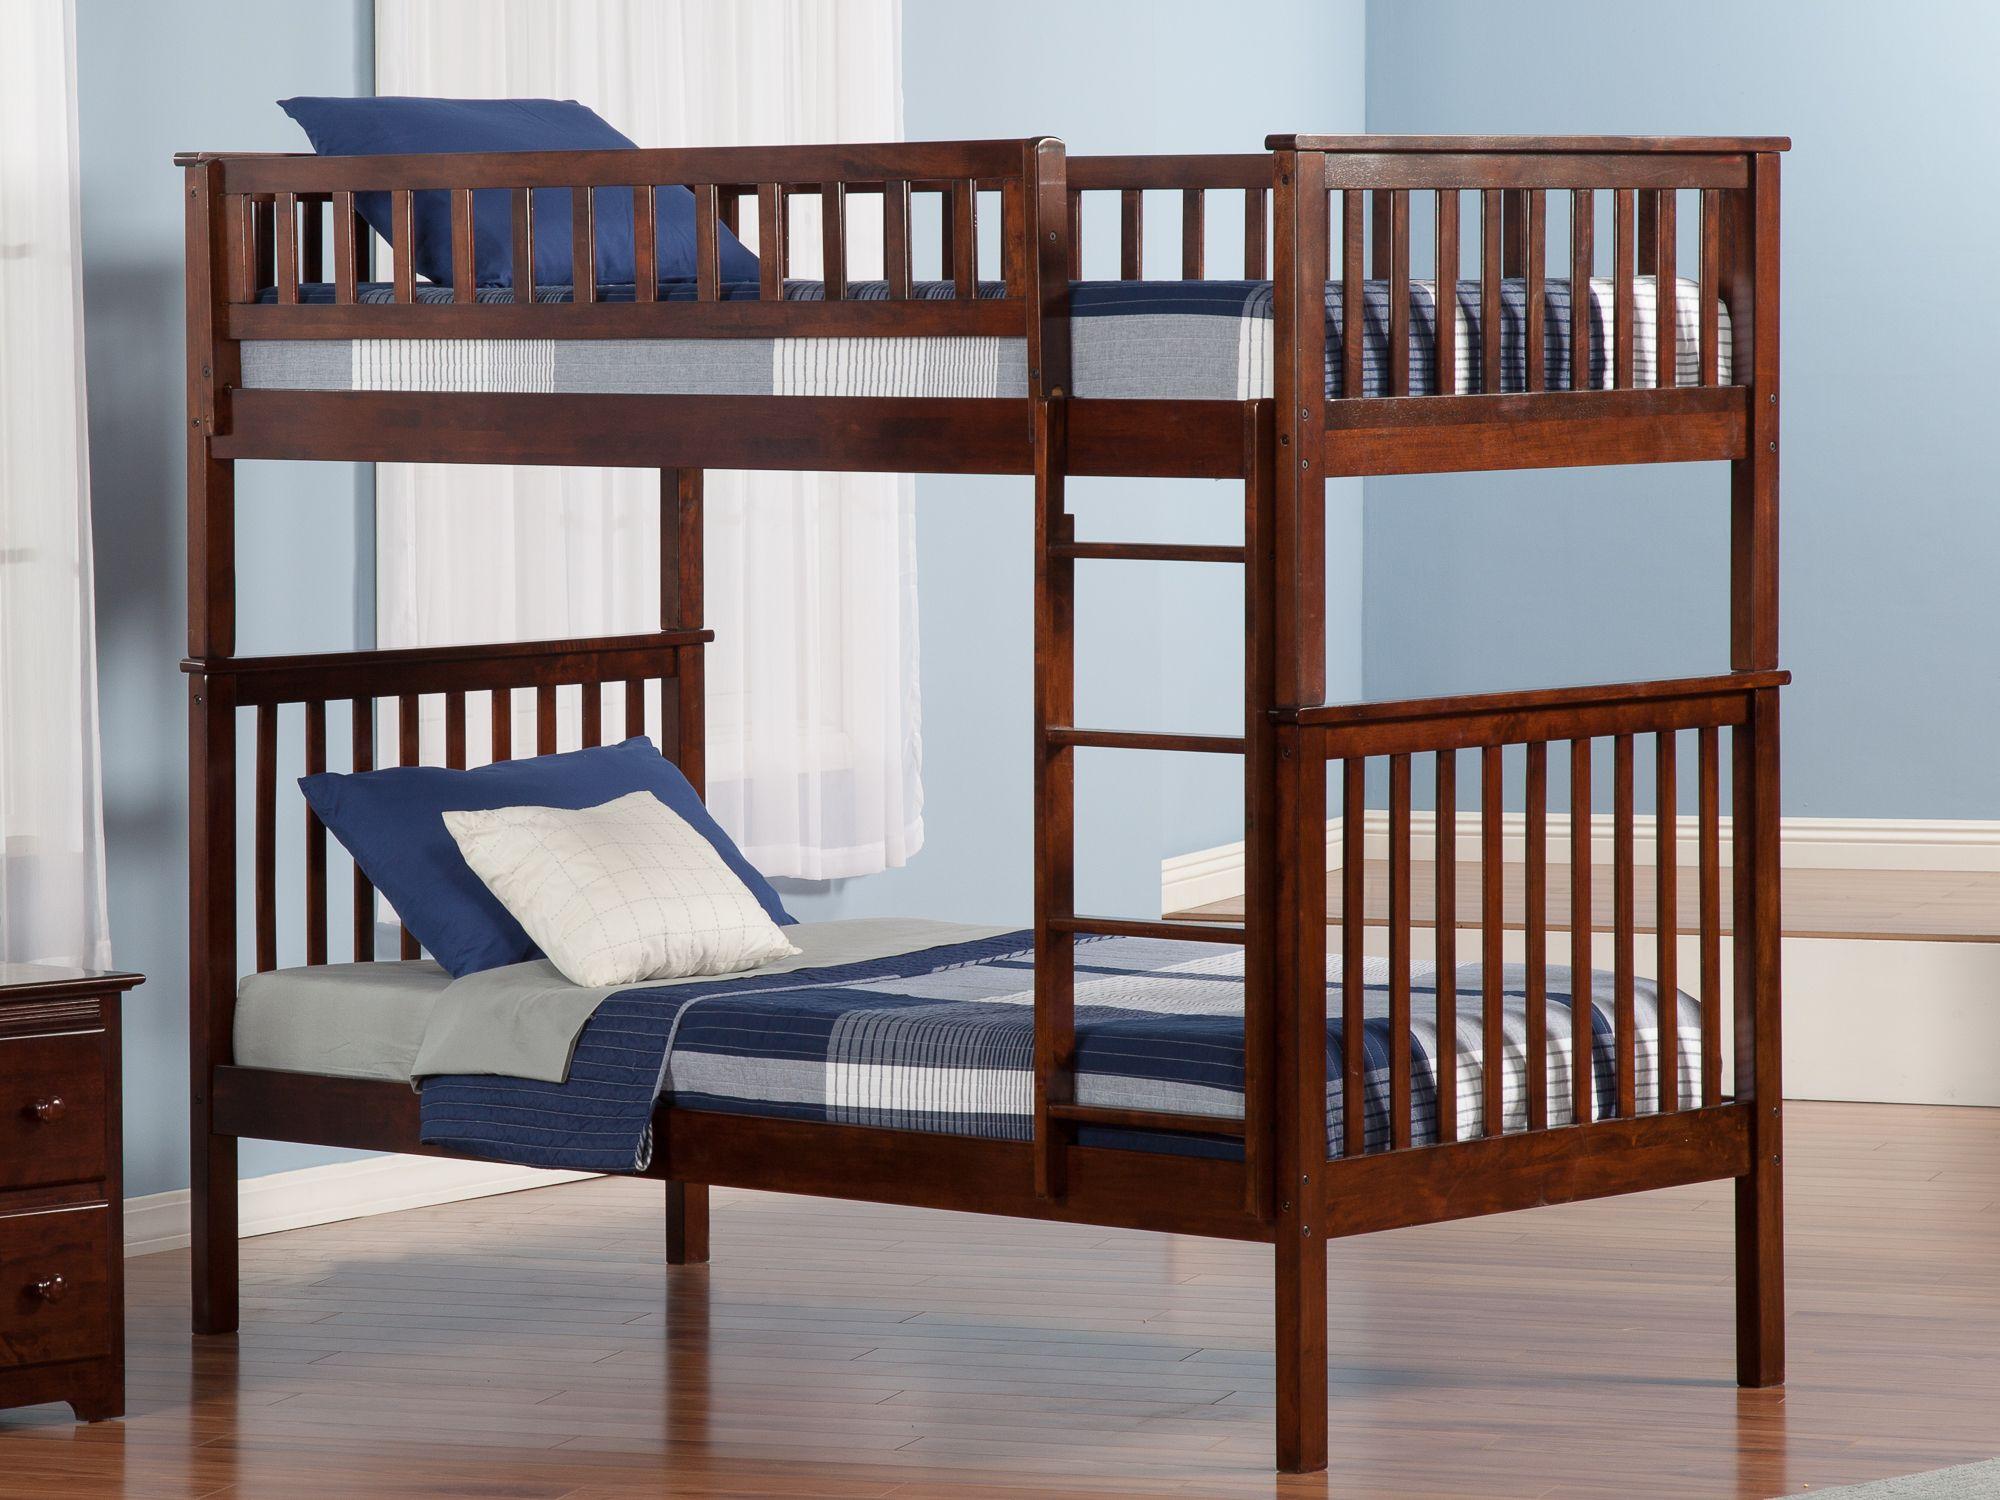 Woodland Bunk Bed Atlantic furniture, Twin bunk beds